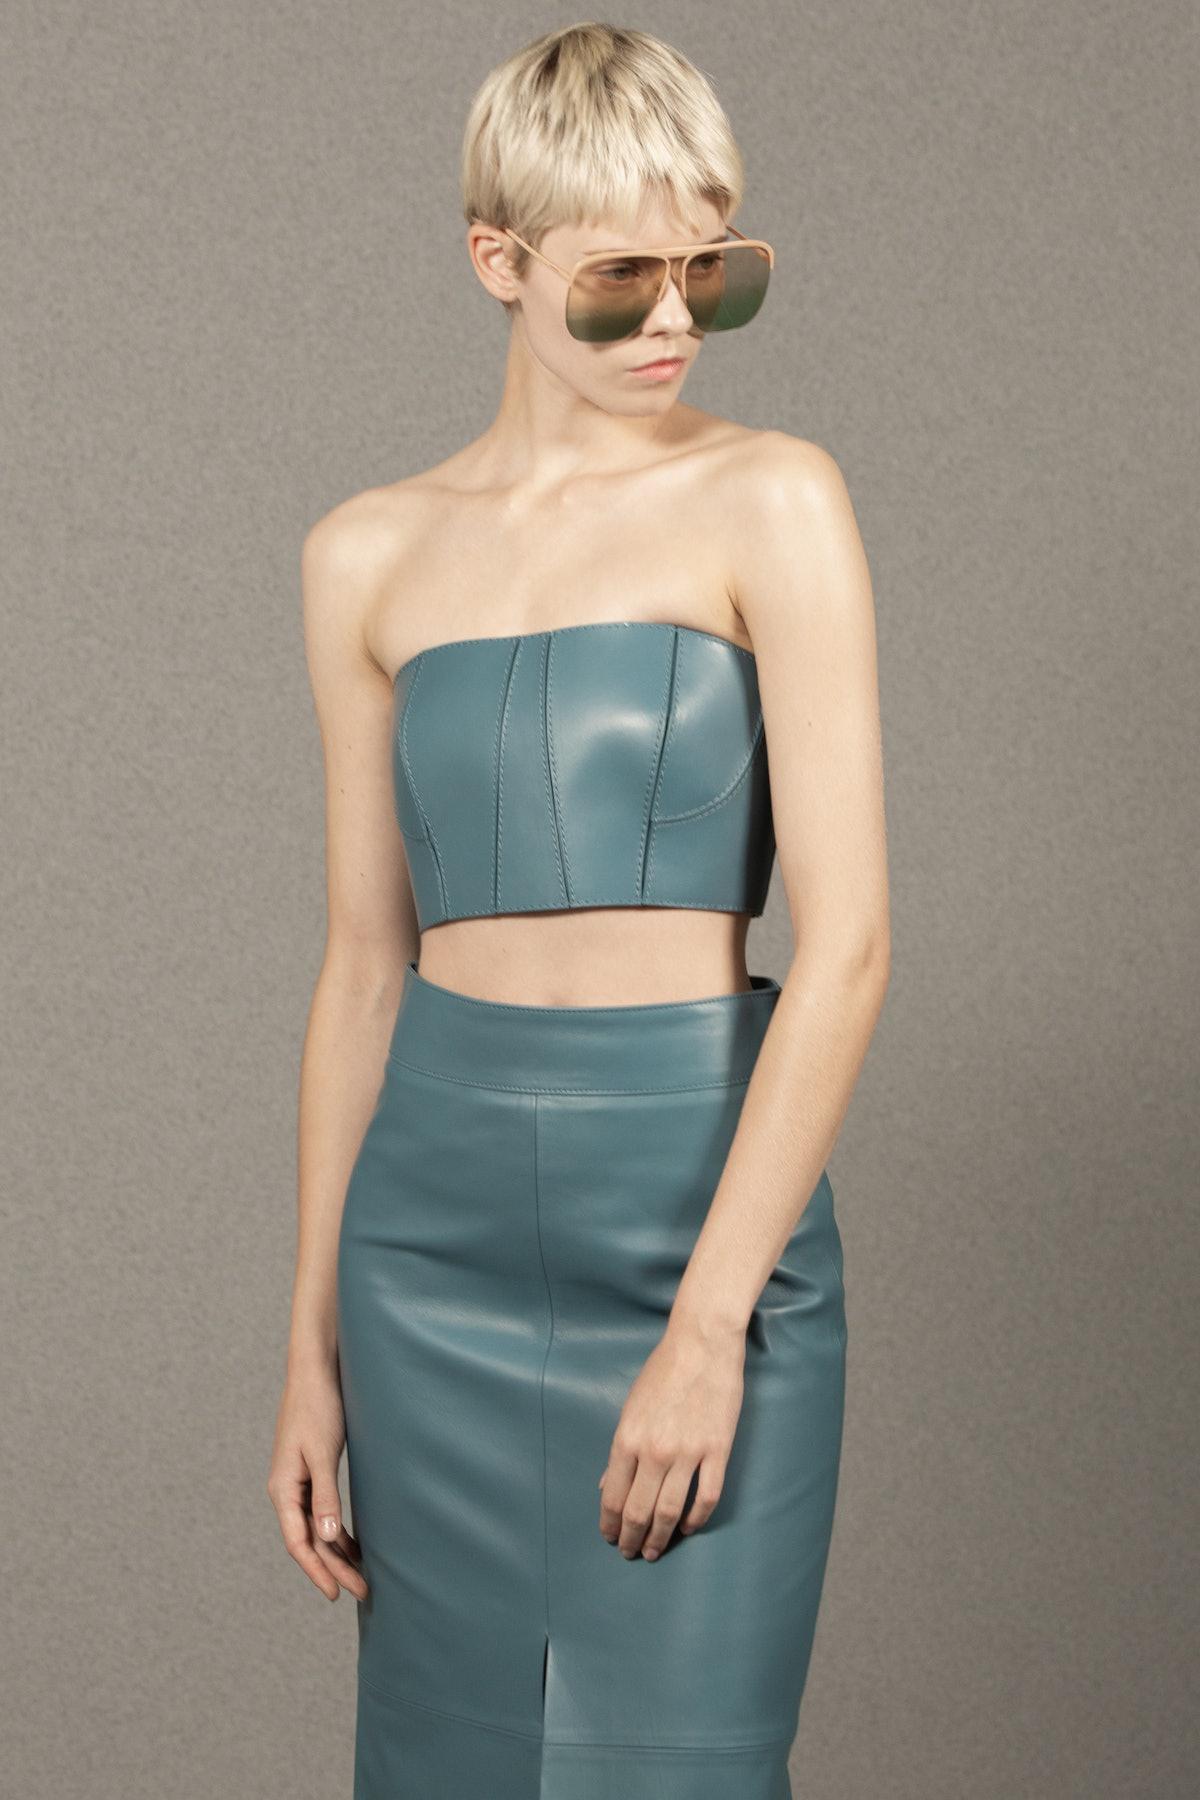 Serichai_Givenchy-124.jpg